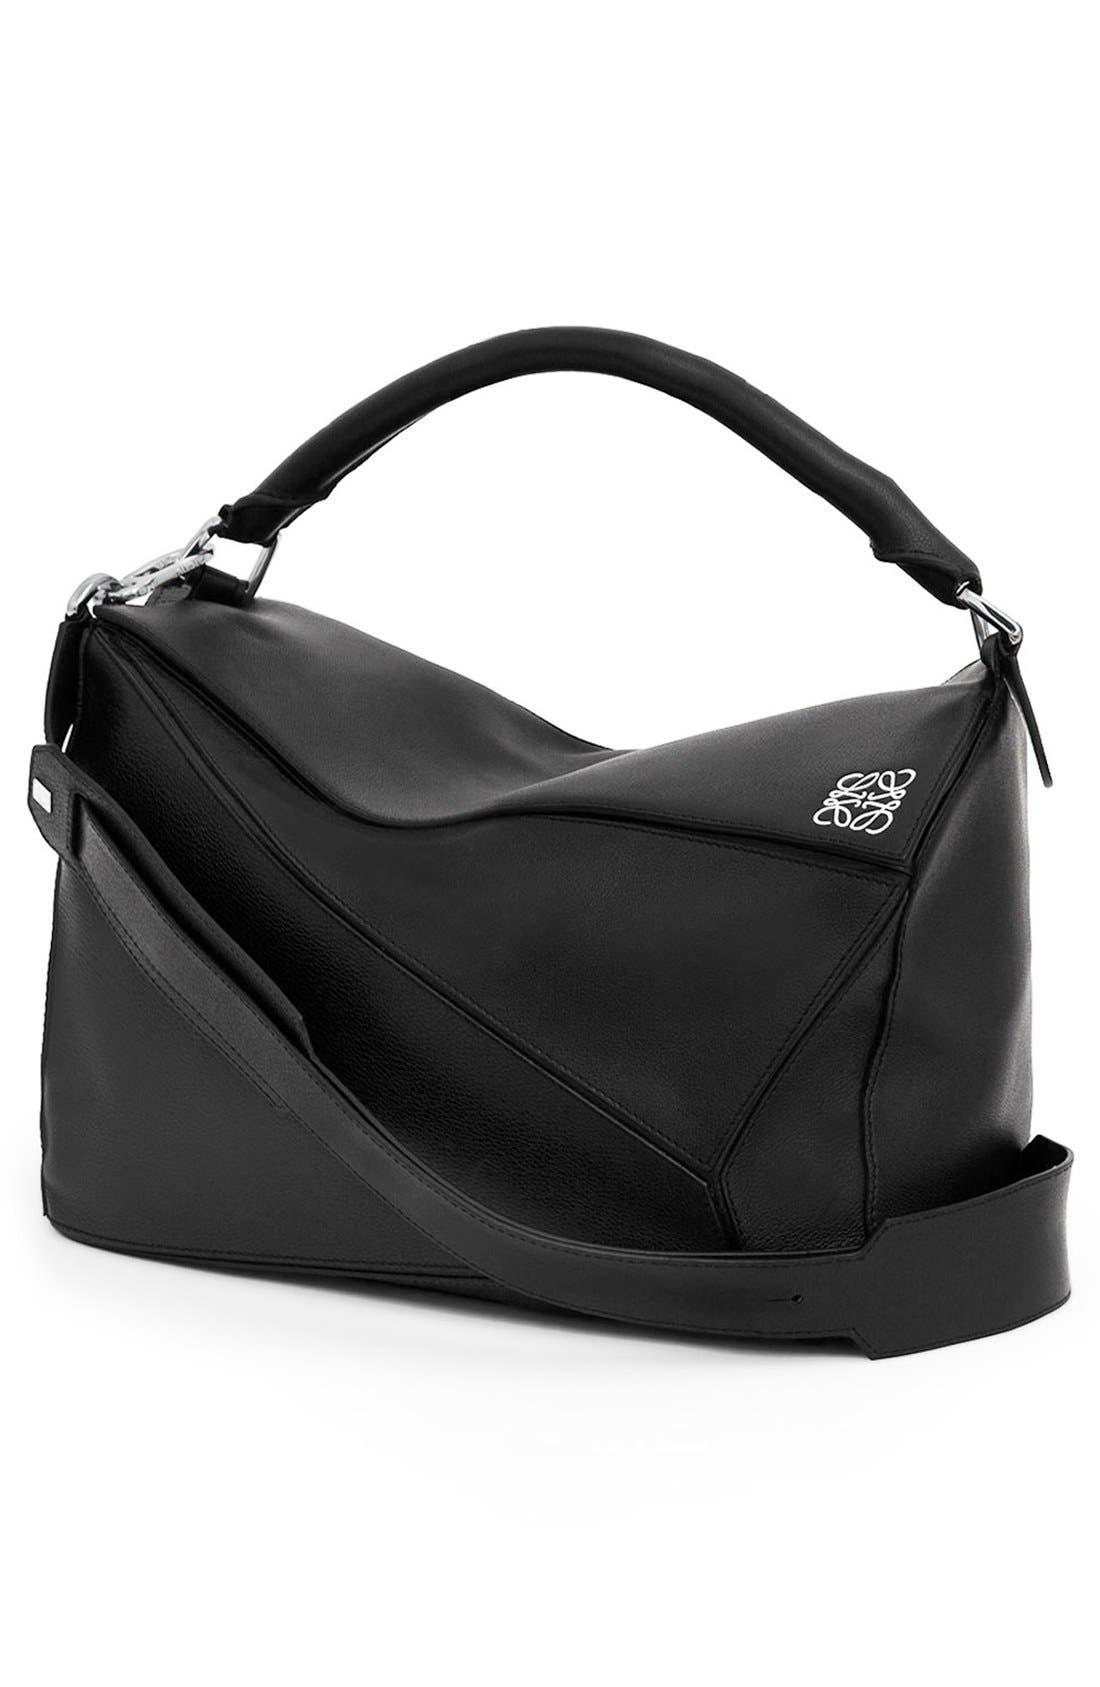 Alternate Image 1 Selected - Loewe 'Large Puzzle' Calfskin Leather Bag